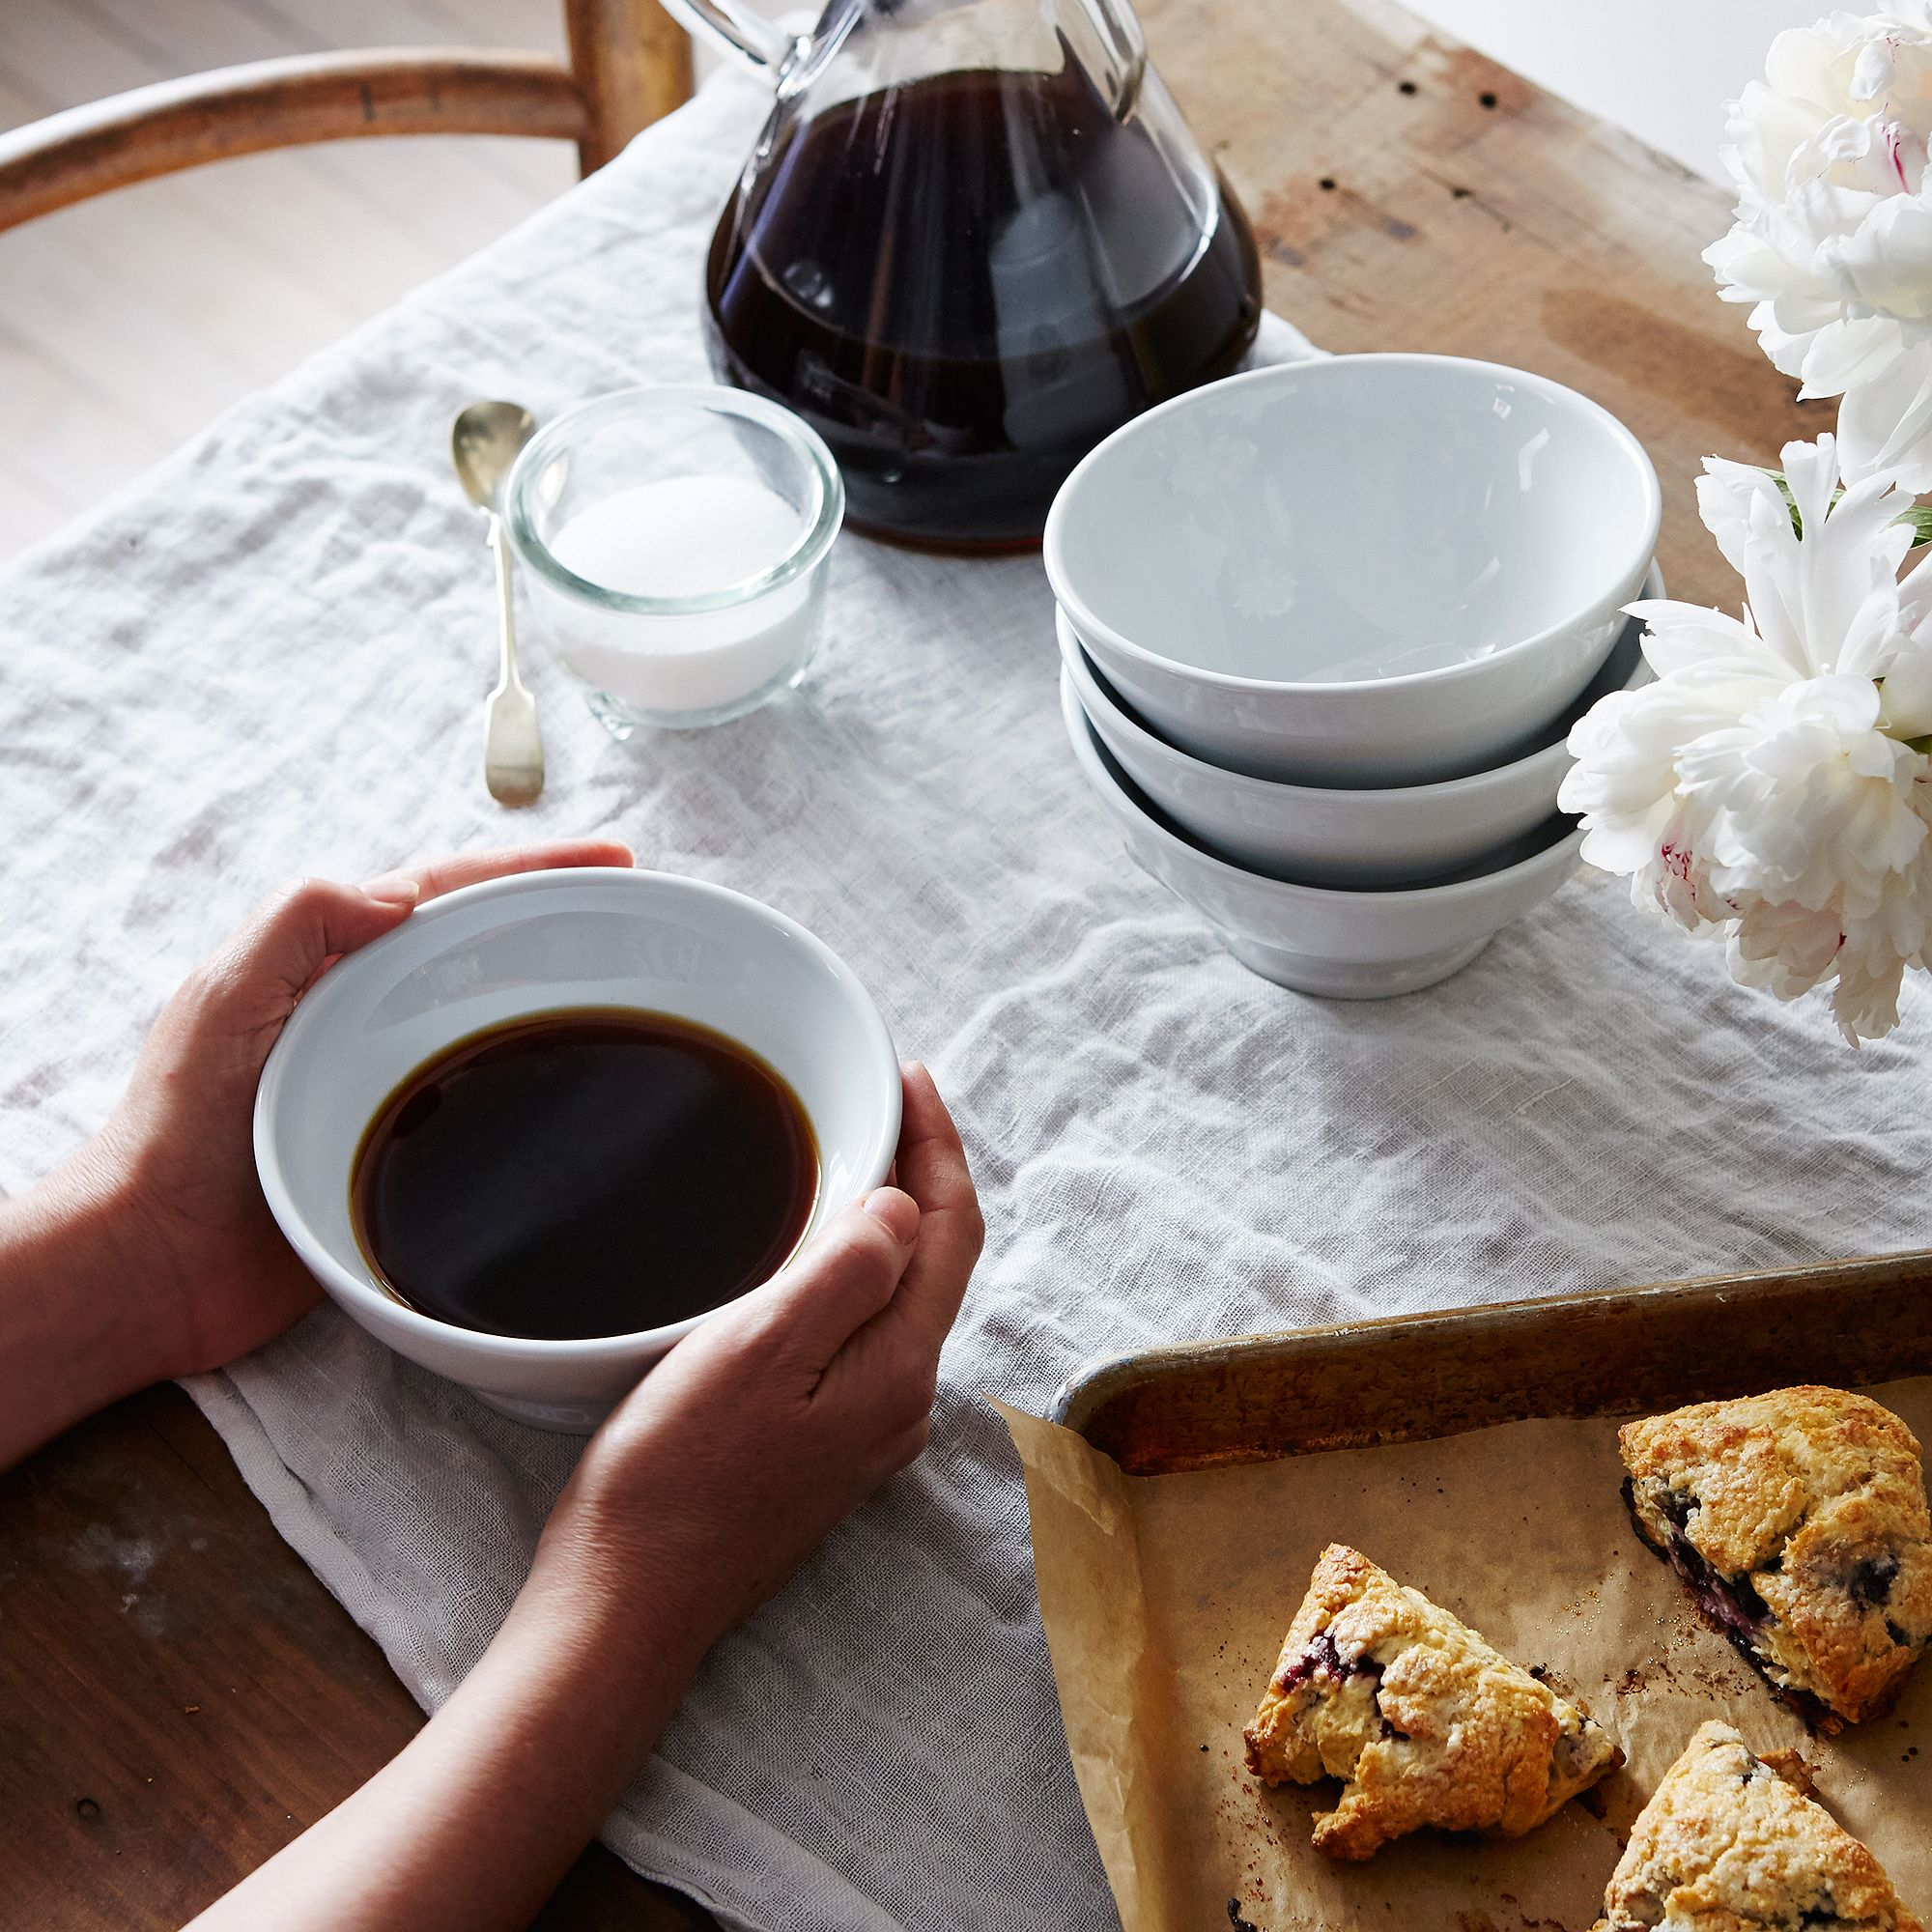 Home Goods And Decor French Coffee Bowl Set Of 4 Porcelain Mug Coffee